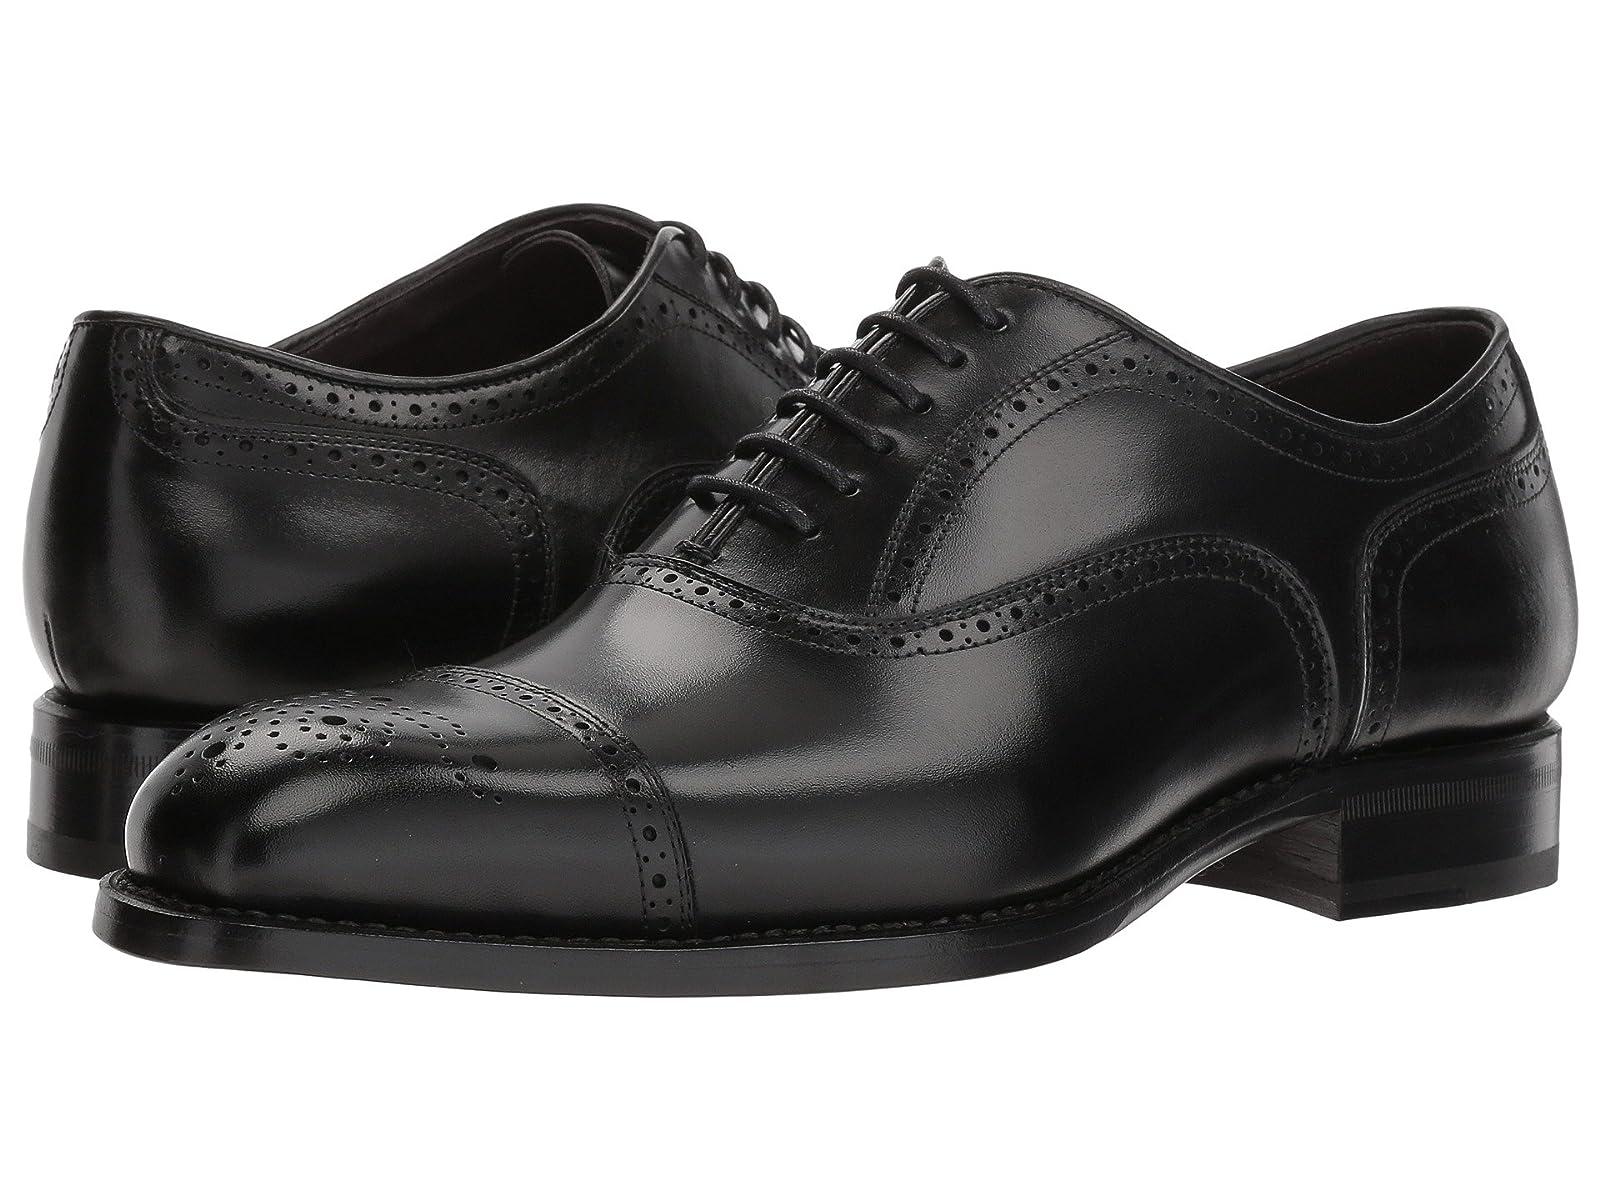 CARLOS by Carlos Santana DistrictAtmospheric grades have affordable shoes